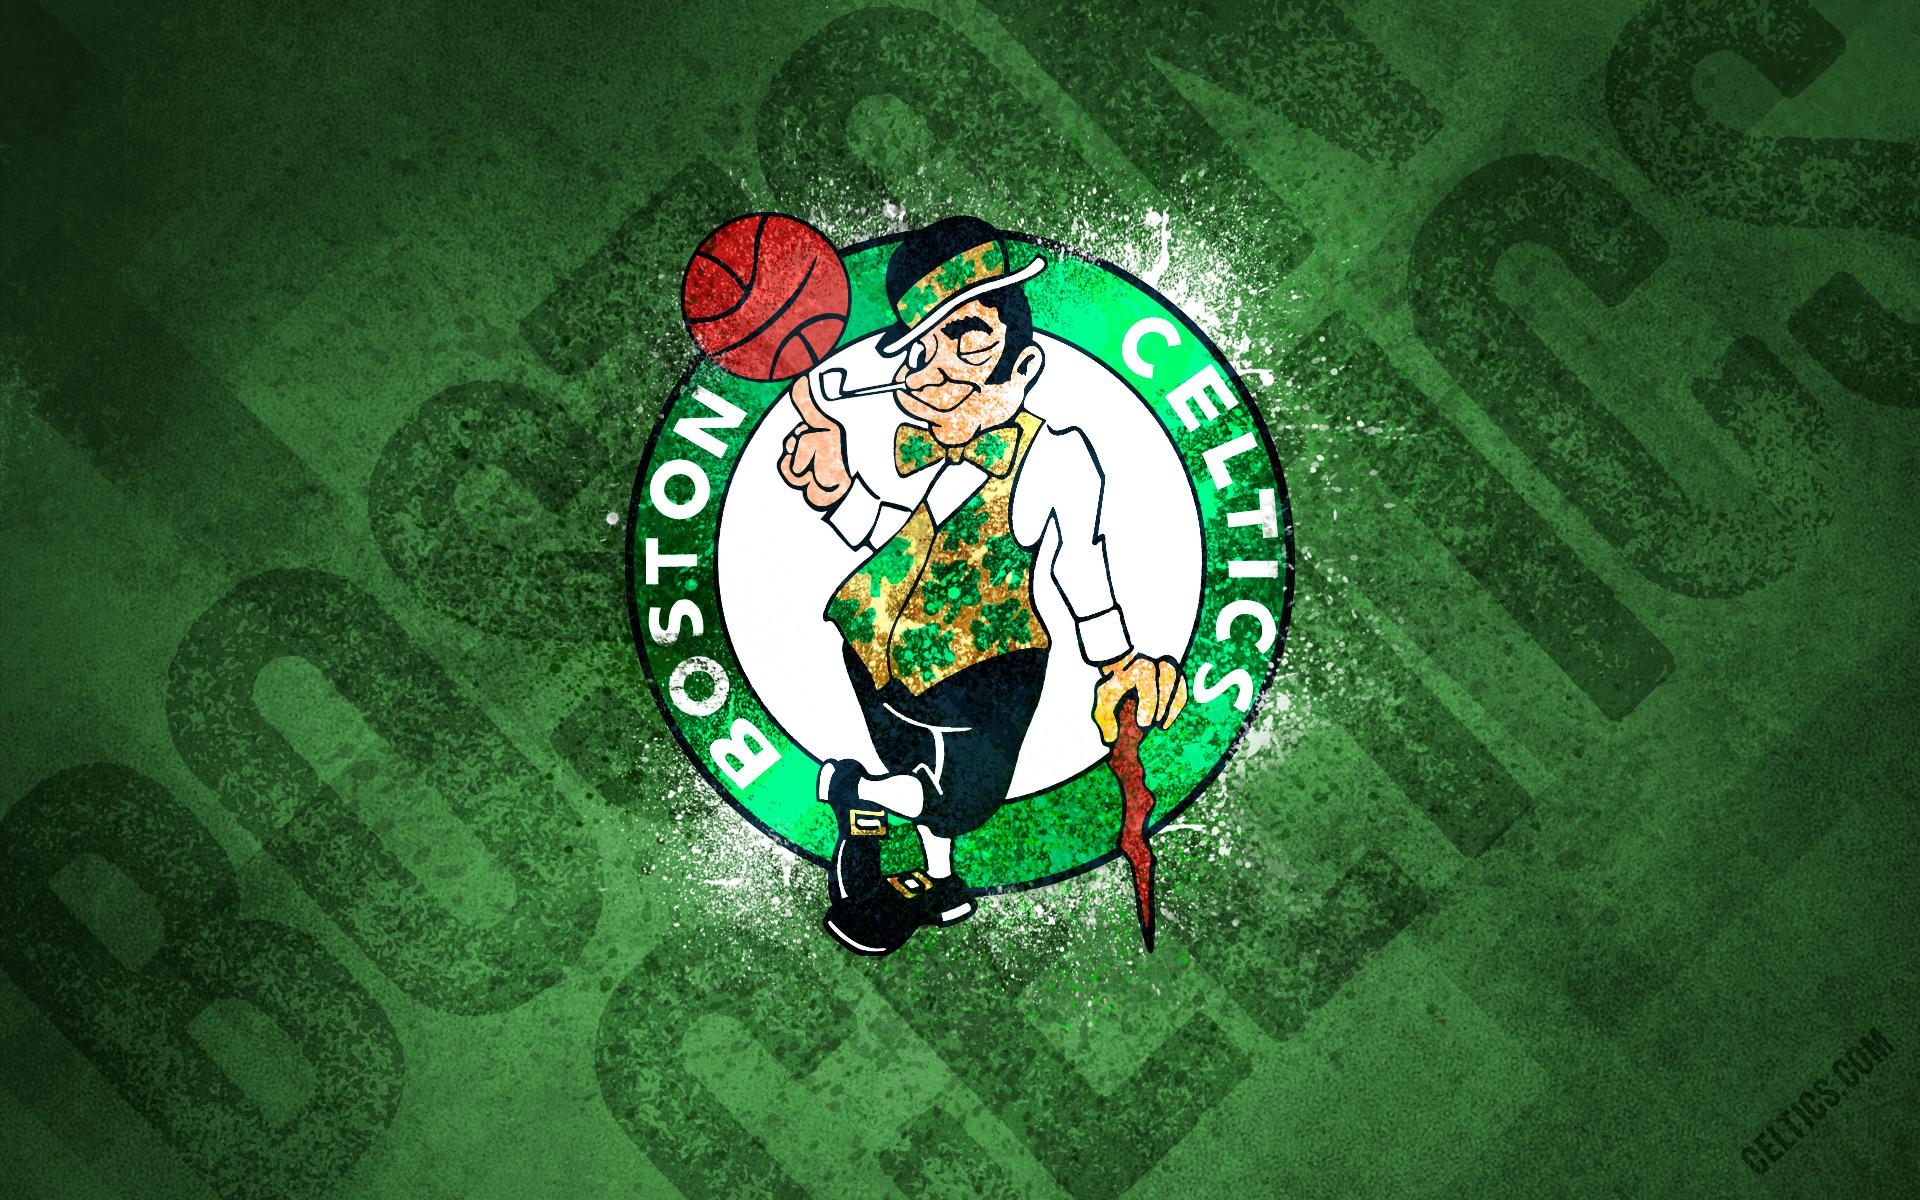 High Resolution Wallpaper | Boston Celtics 1920x1200 px